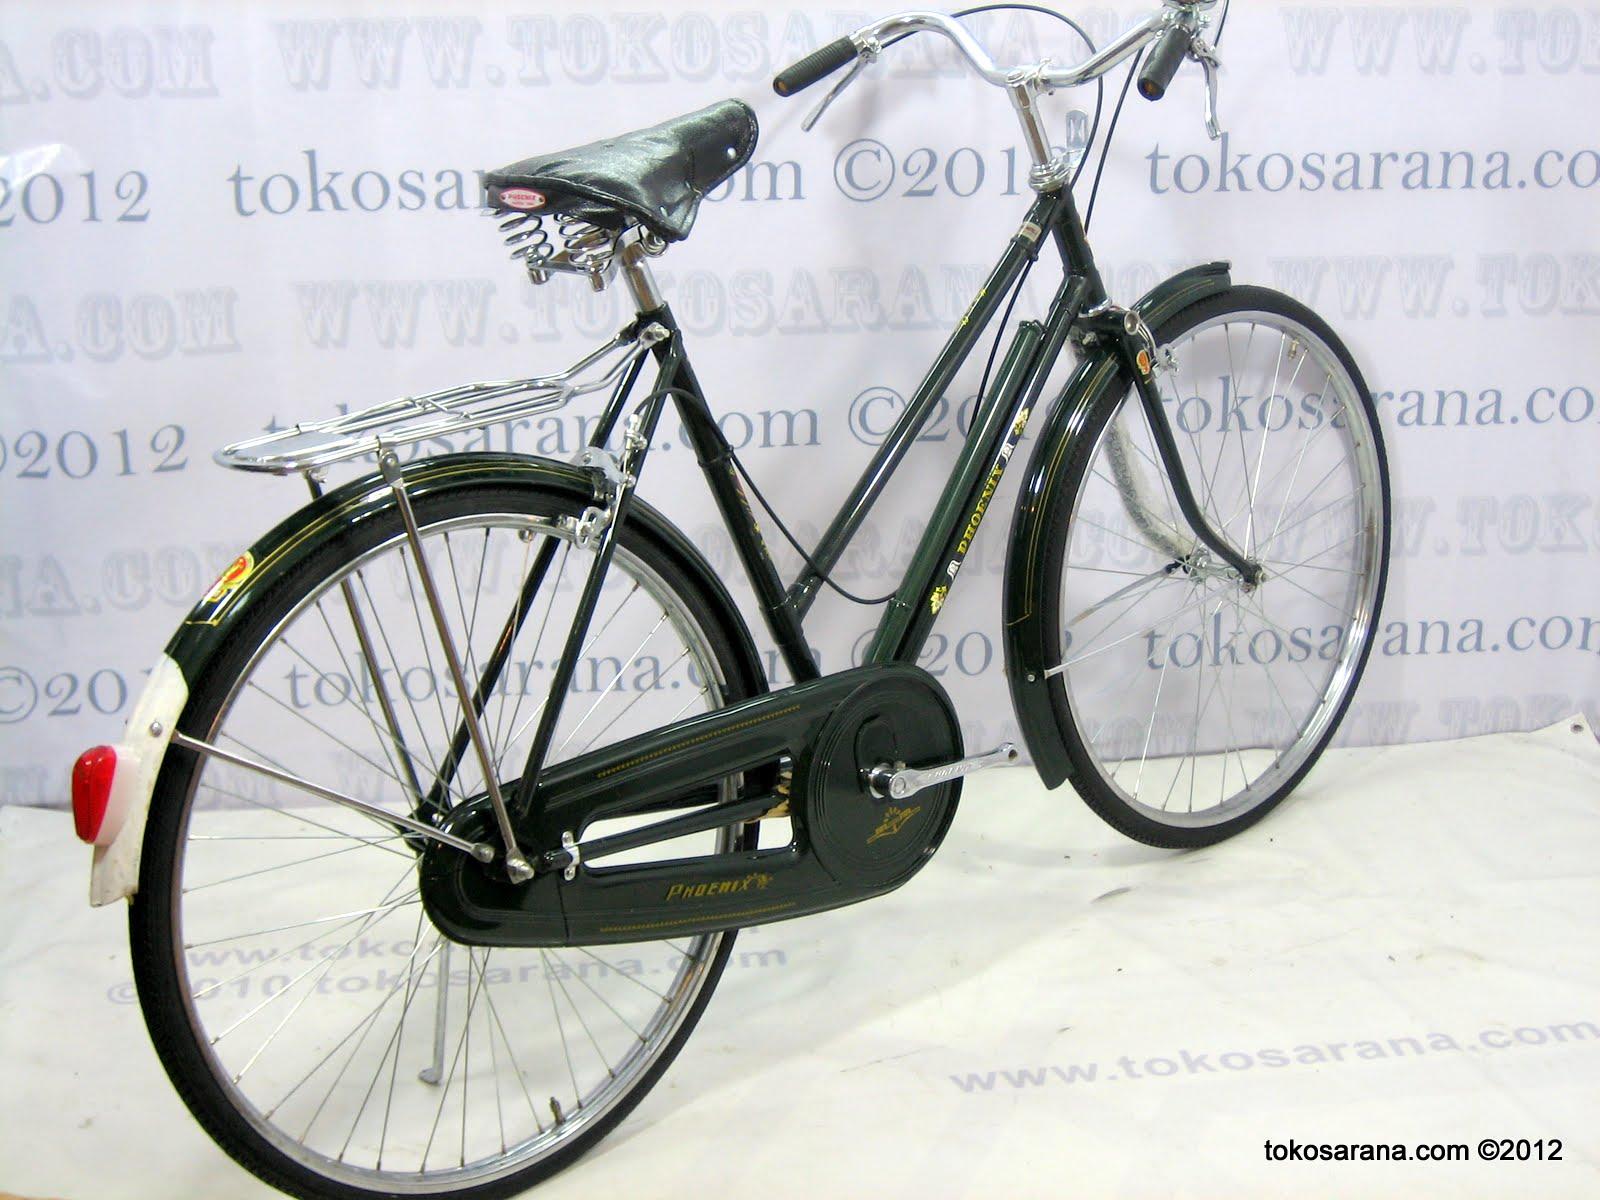 tokomagenta: A Showcase of Products: Heavy-duty Bike